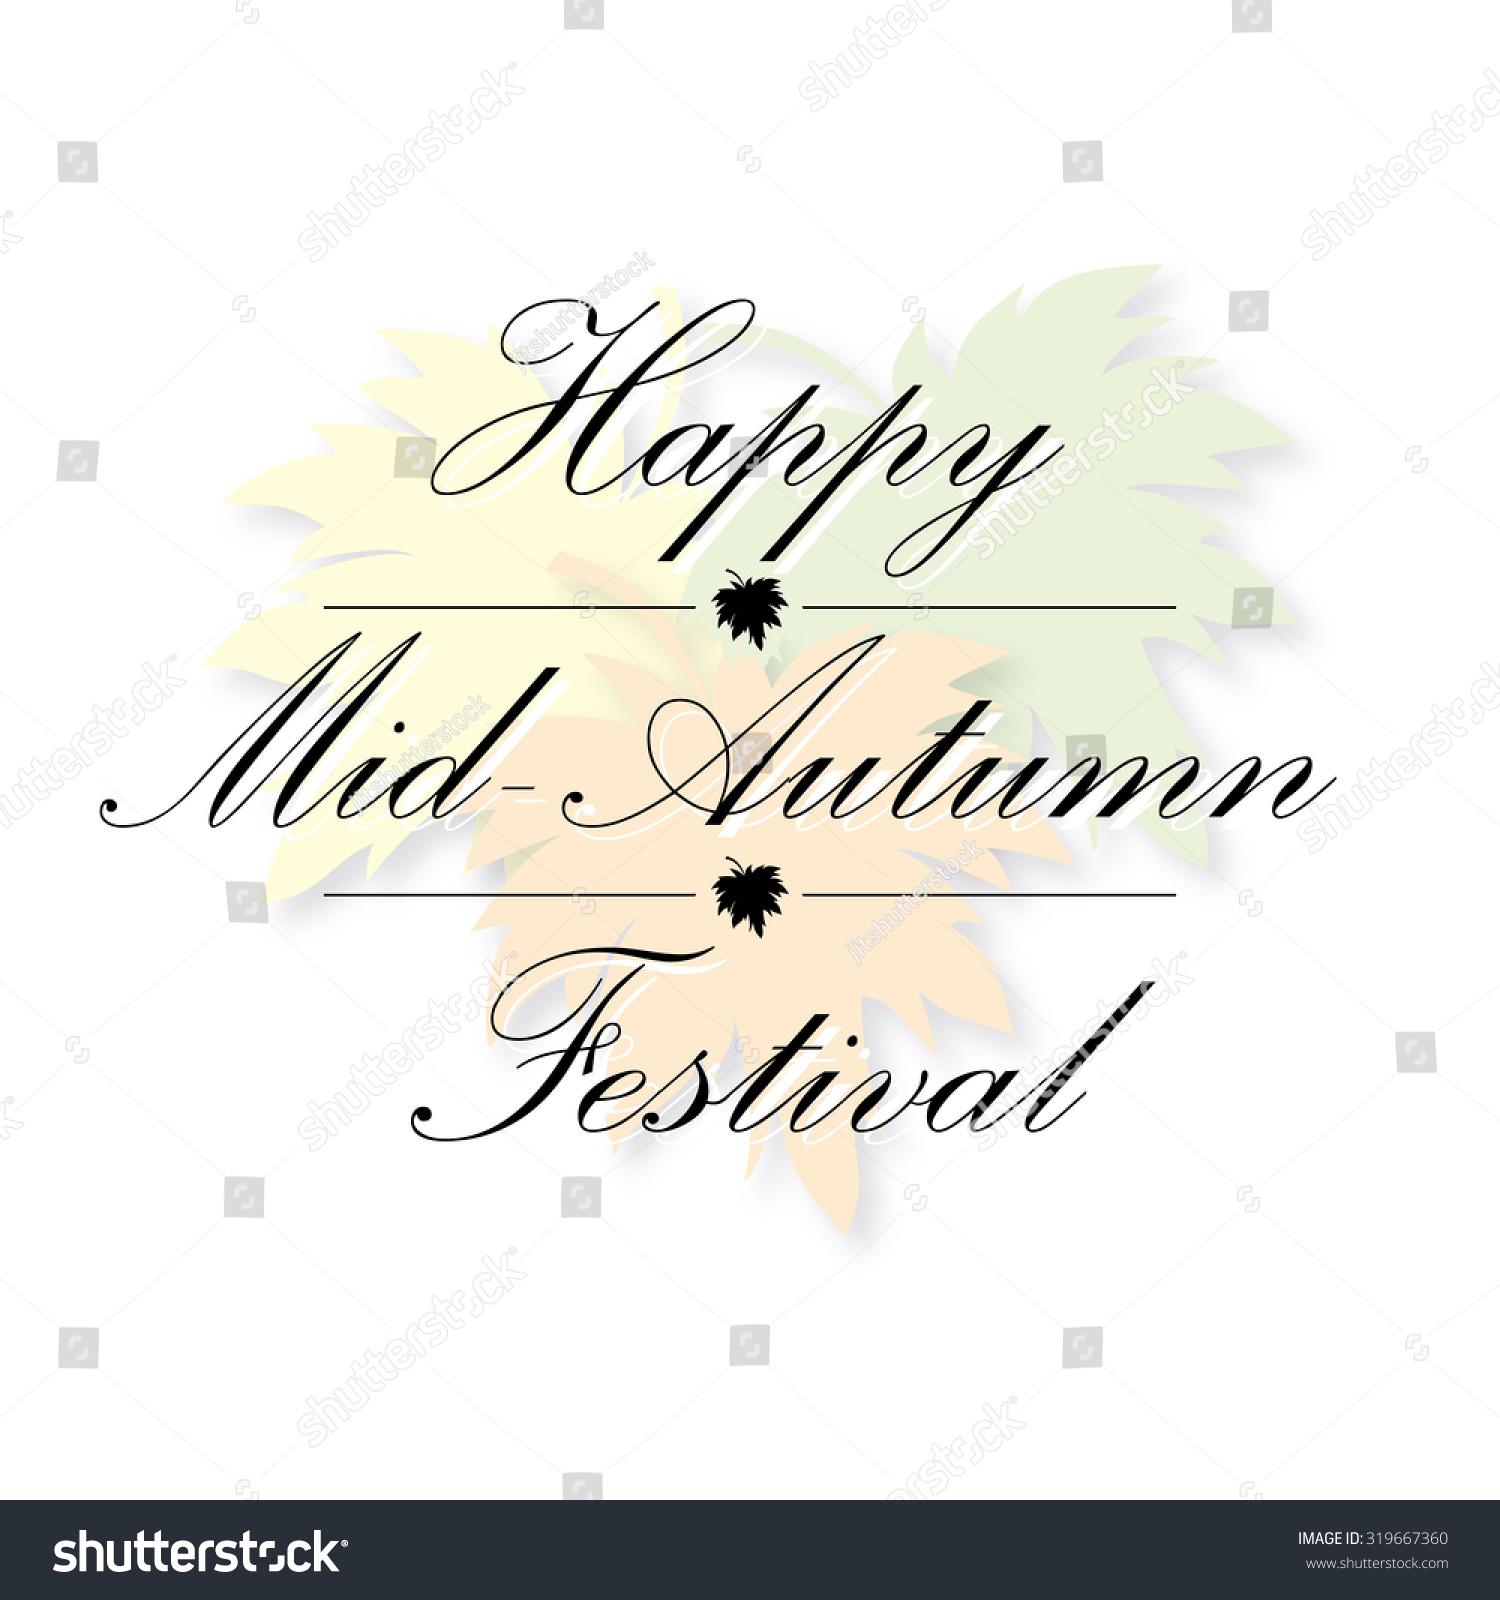 Happy mid autumn festival greeting card stock vector 319667360 happy mid autumn festival greeting card vector kristyandbryce Choice Image